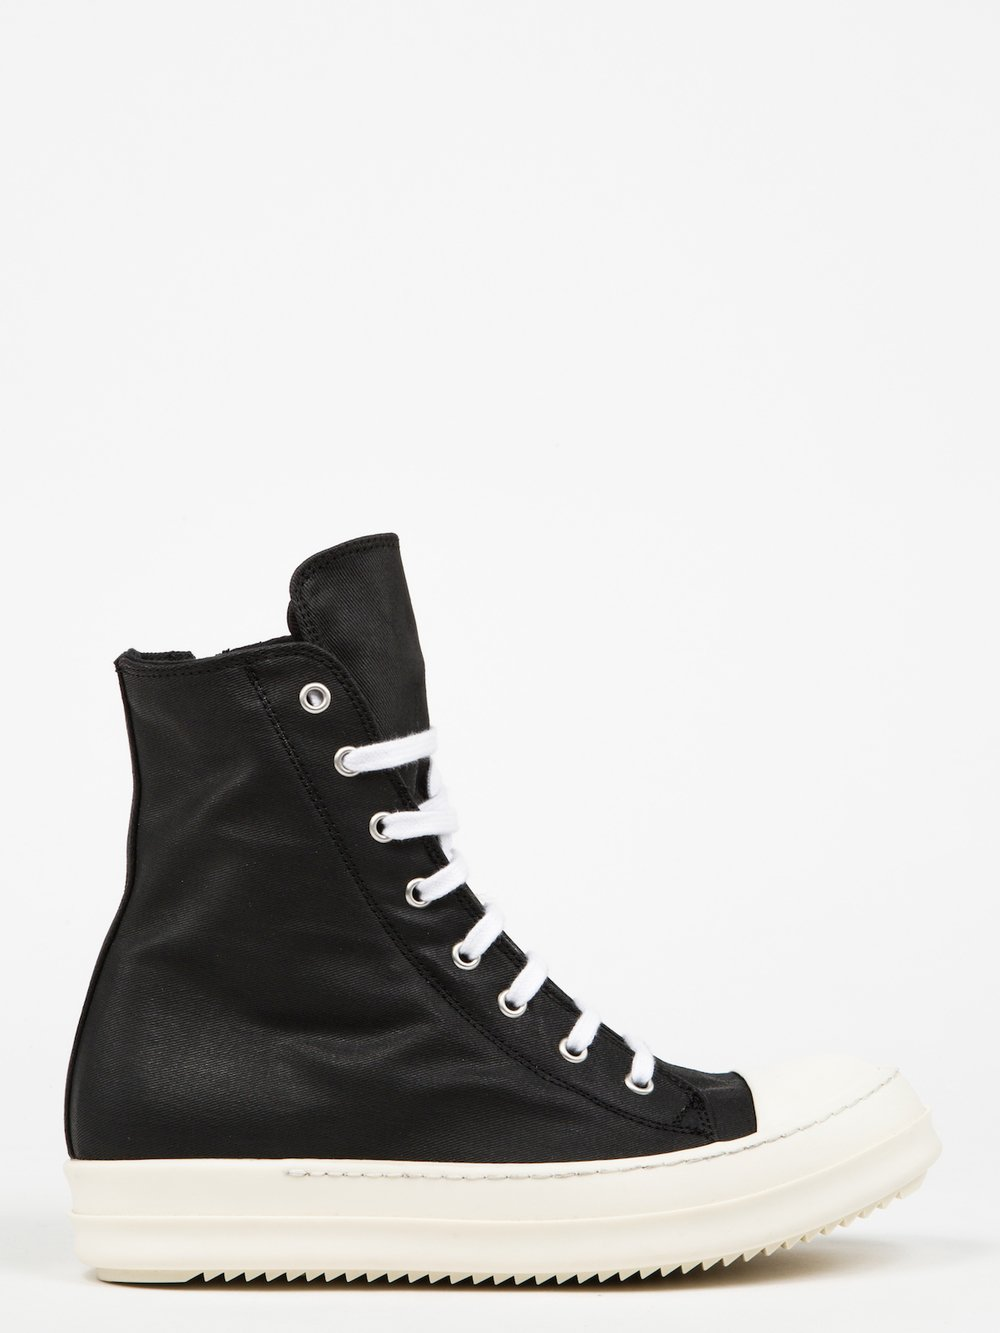 drkshdw-shoes-nx14sd7800t-09 by drkshdw